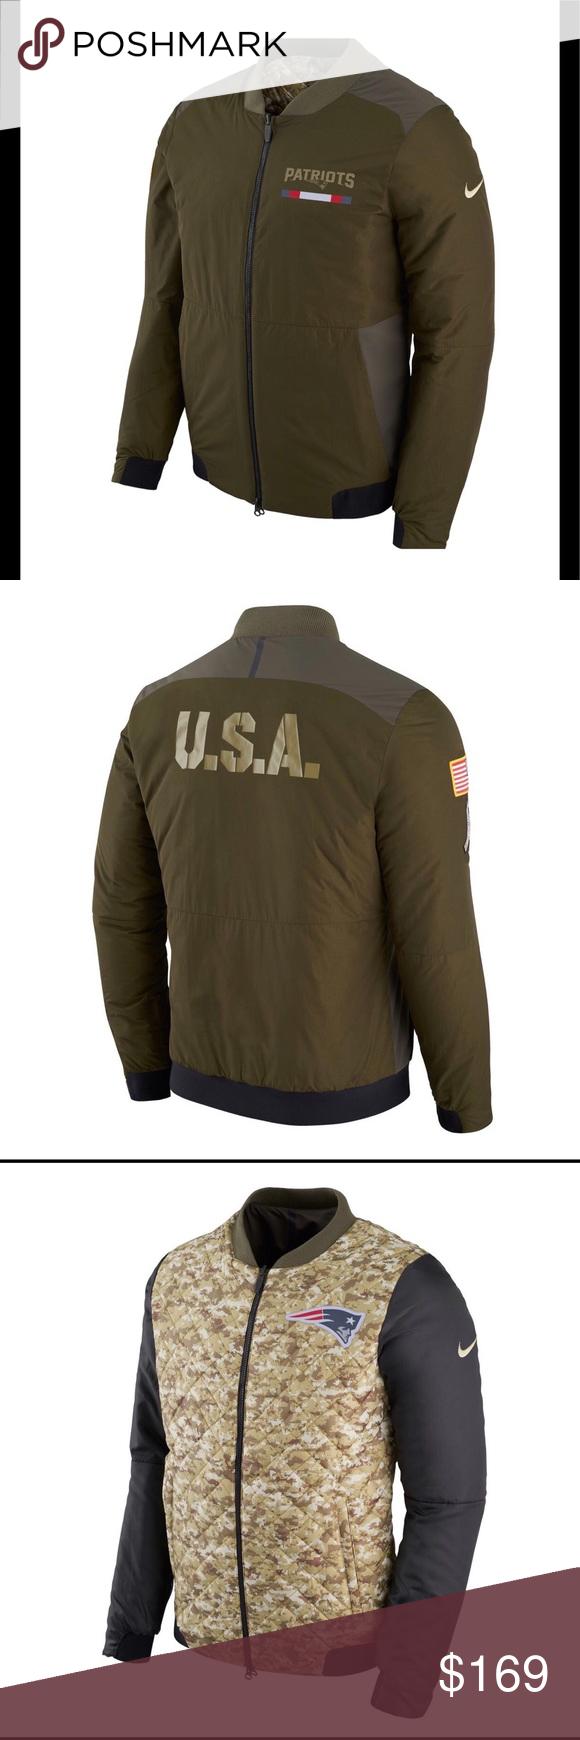 reputable site 7f49a 0368e Nike salute to service bomber jacket NWT Nike men's New ...